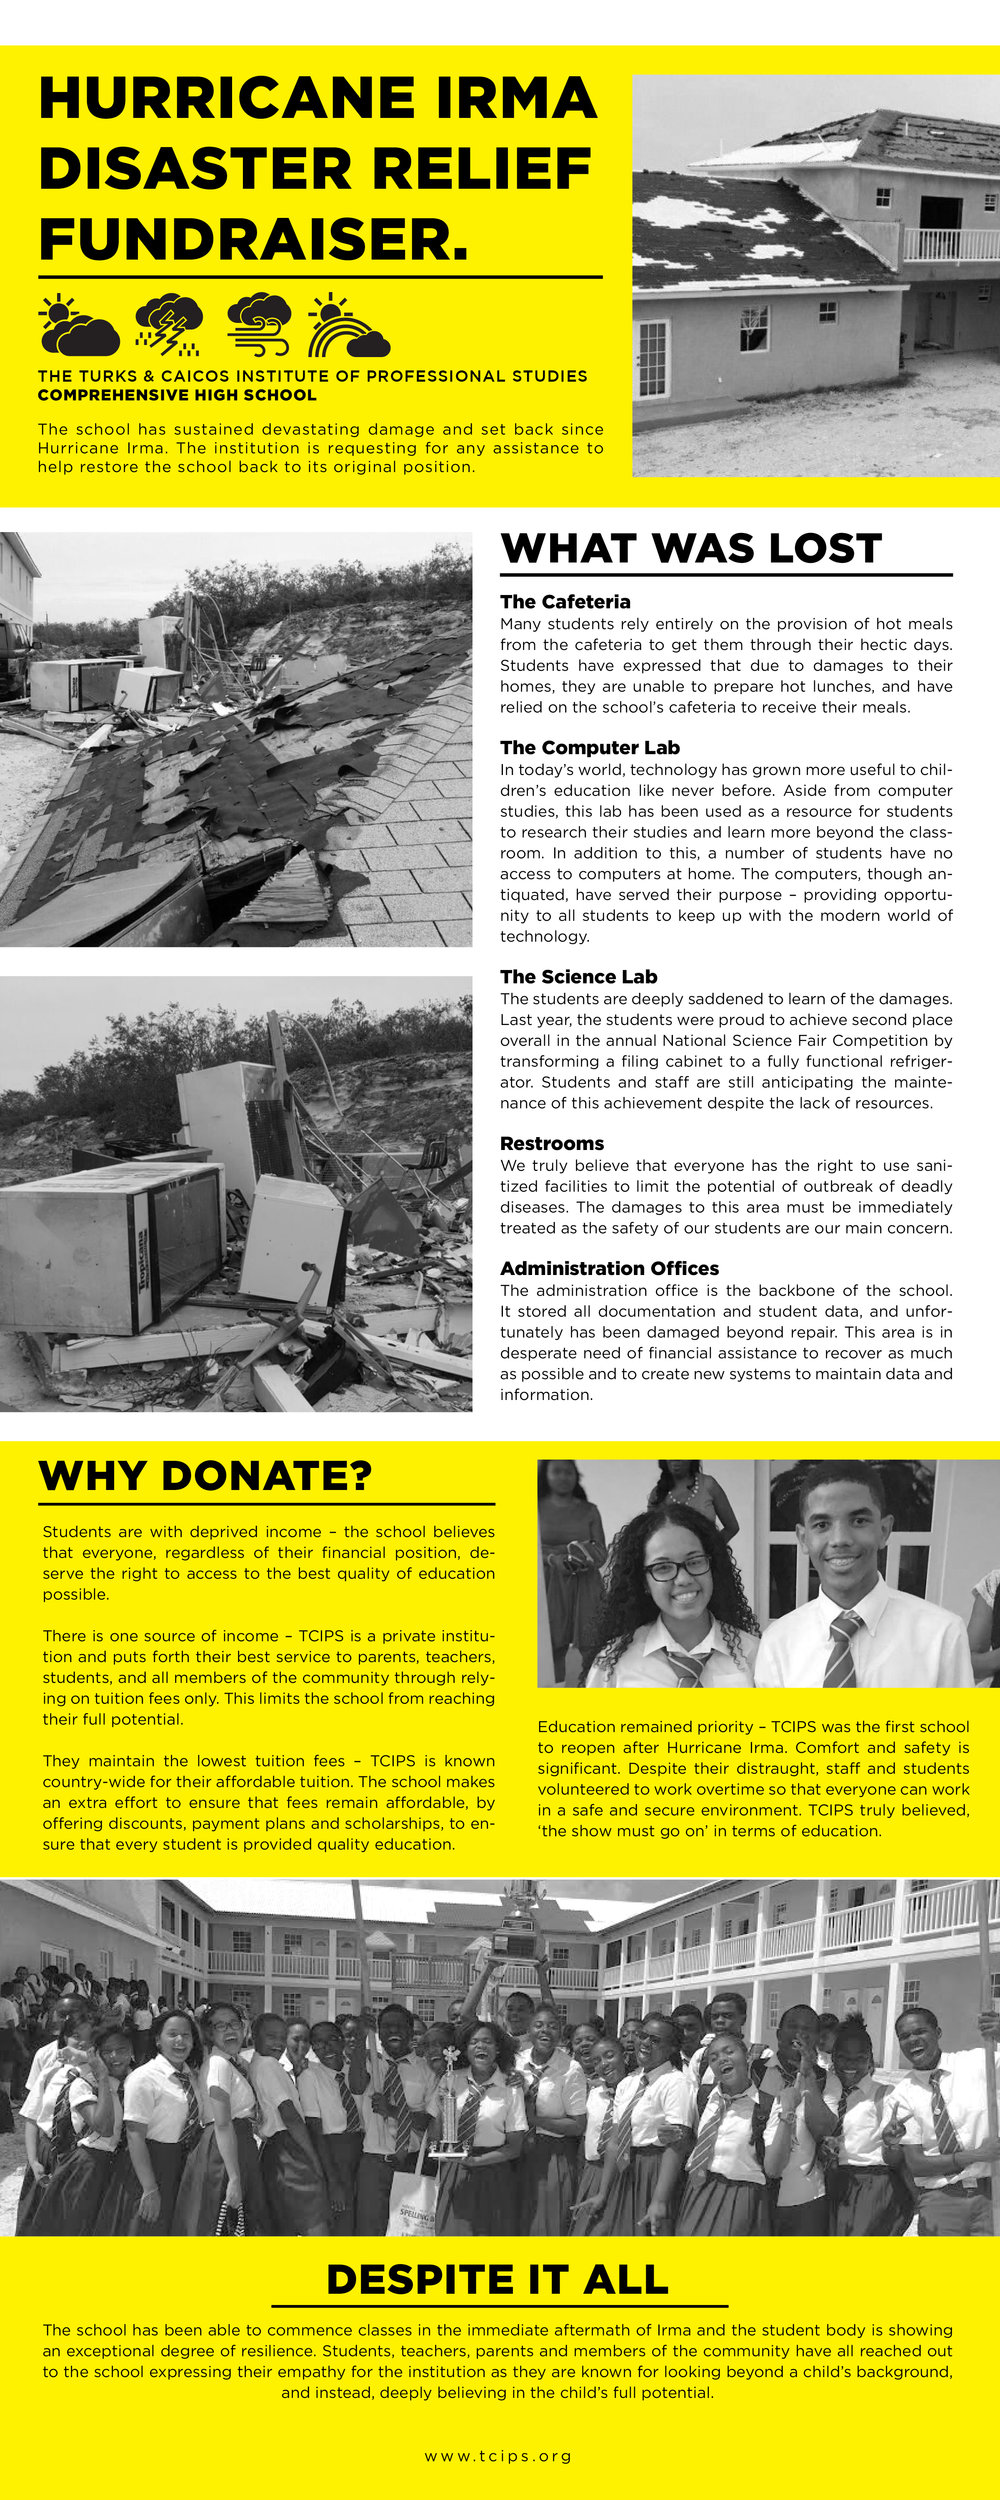 Hurricane Irma Relief_v2.jpg